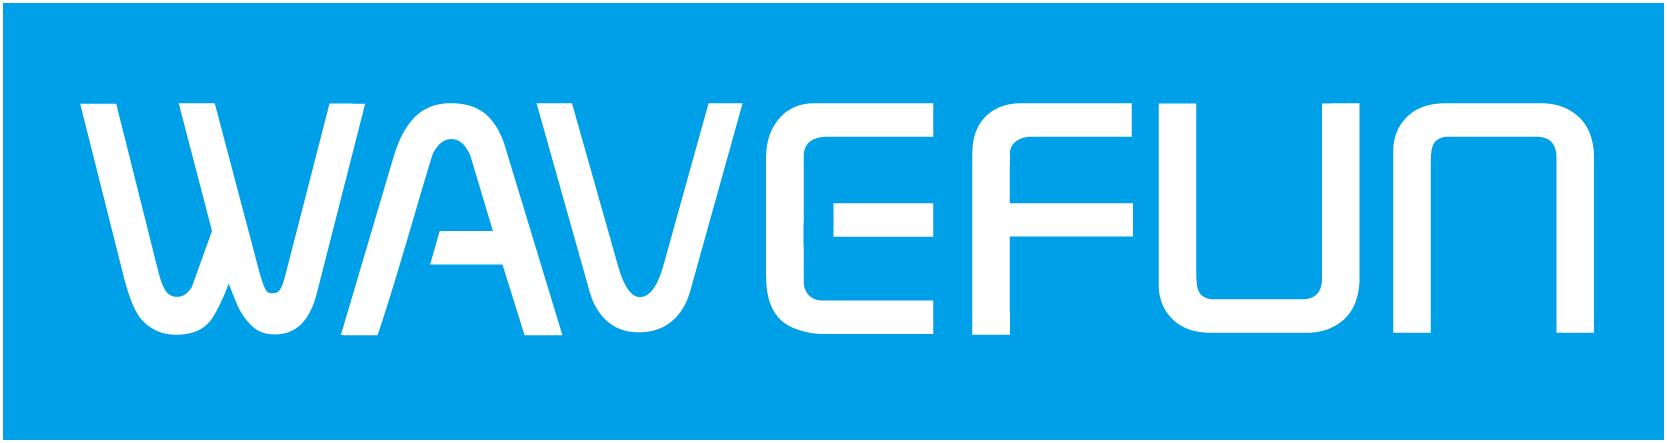 wavefun logo